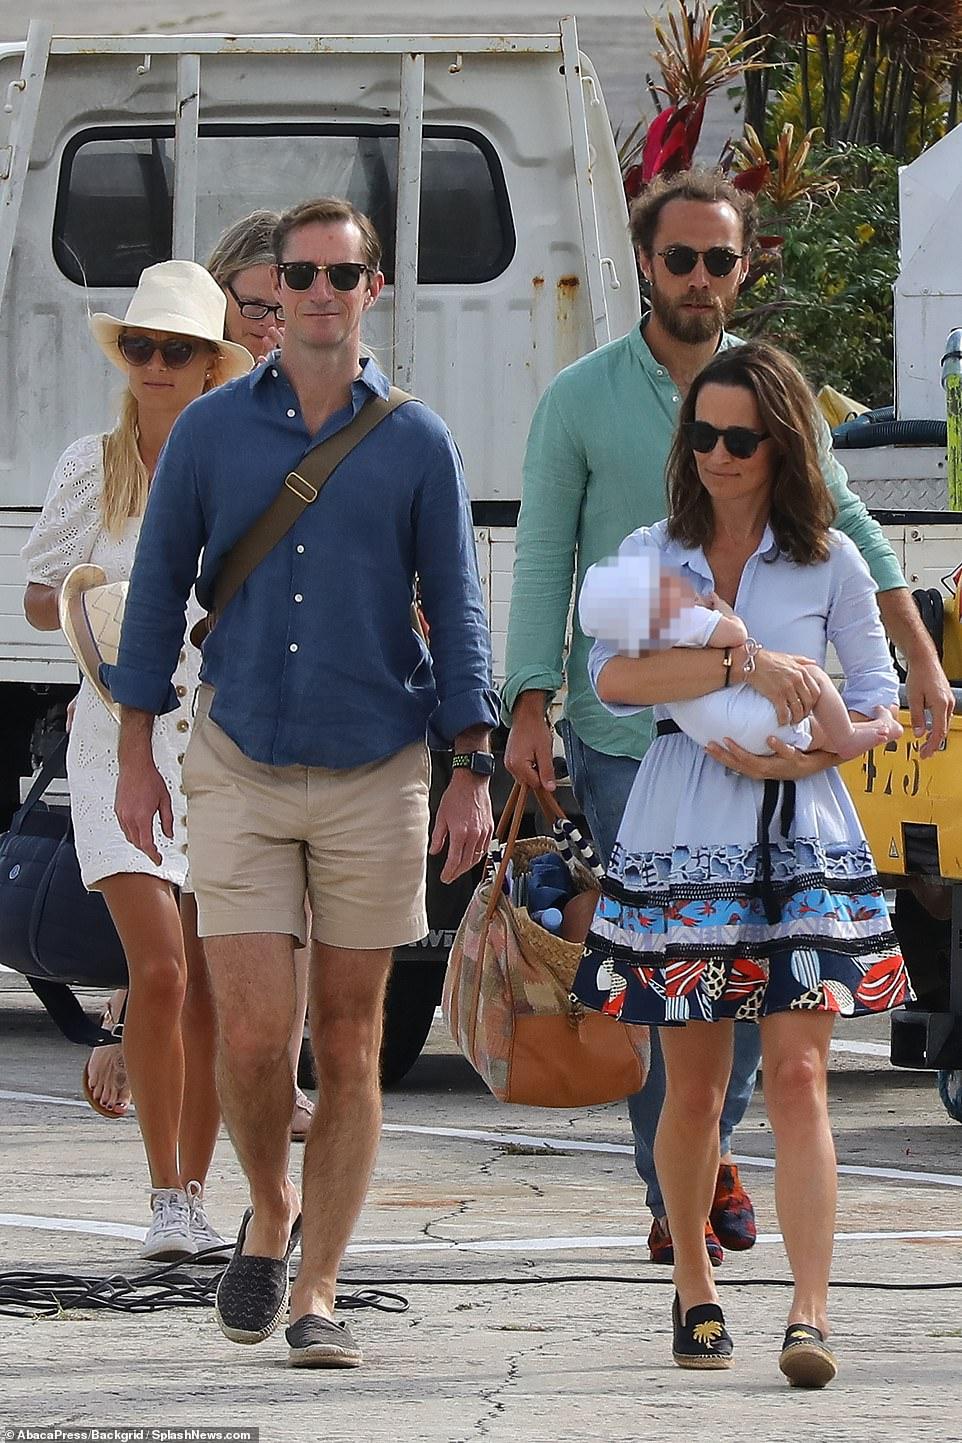 Pippa Middleton Ha nacido su primer hijo Arthur Michael William Matthews  Pgina 176